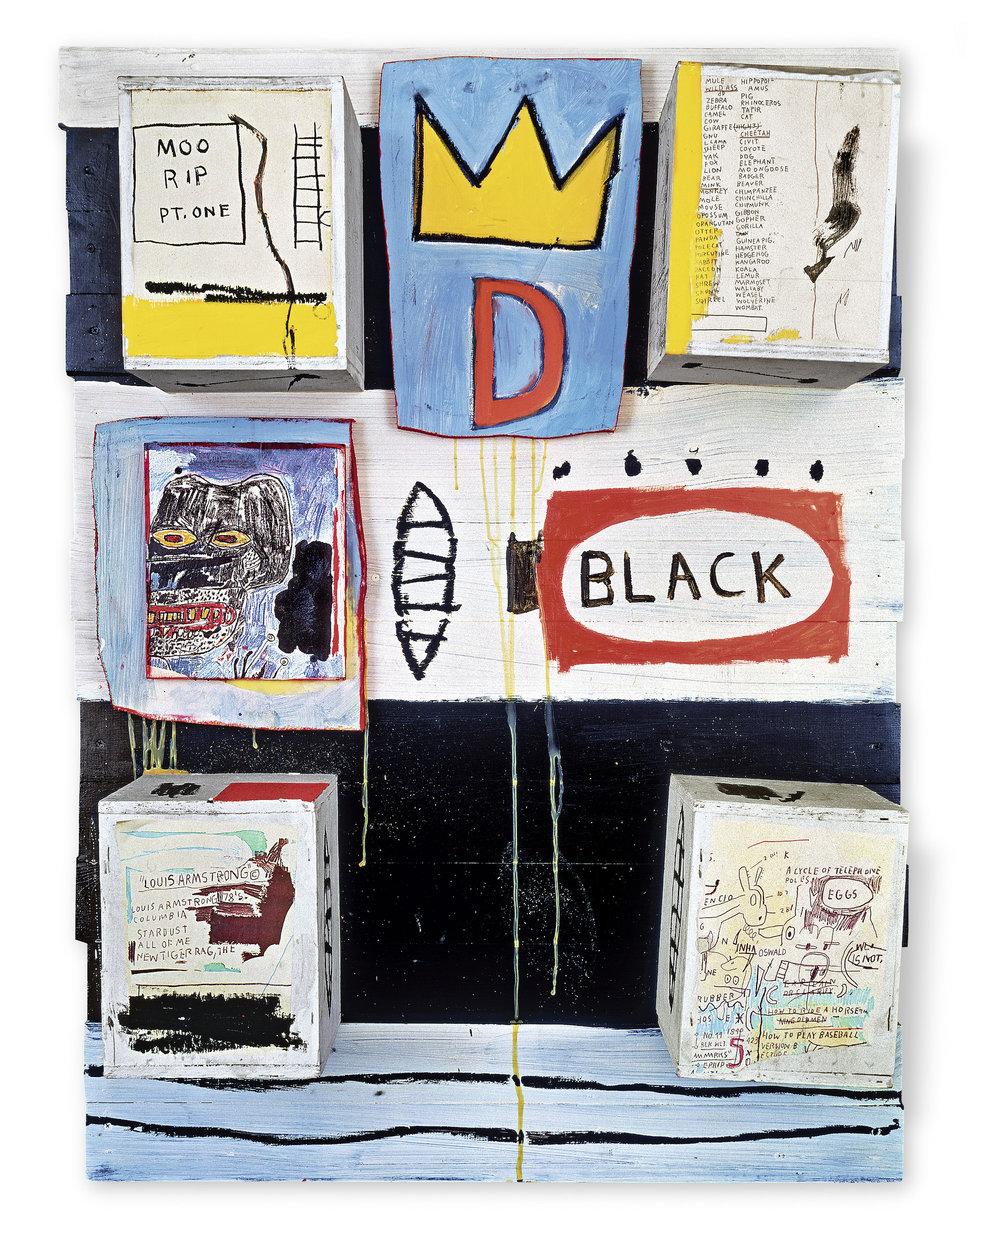 XL_Basquiat_01141_421.jpg